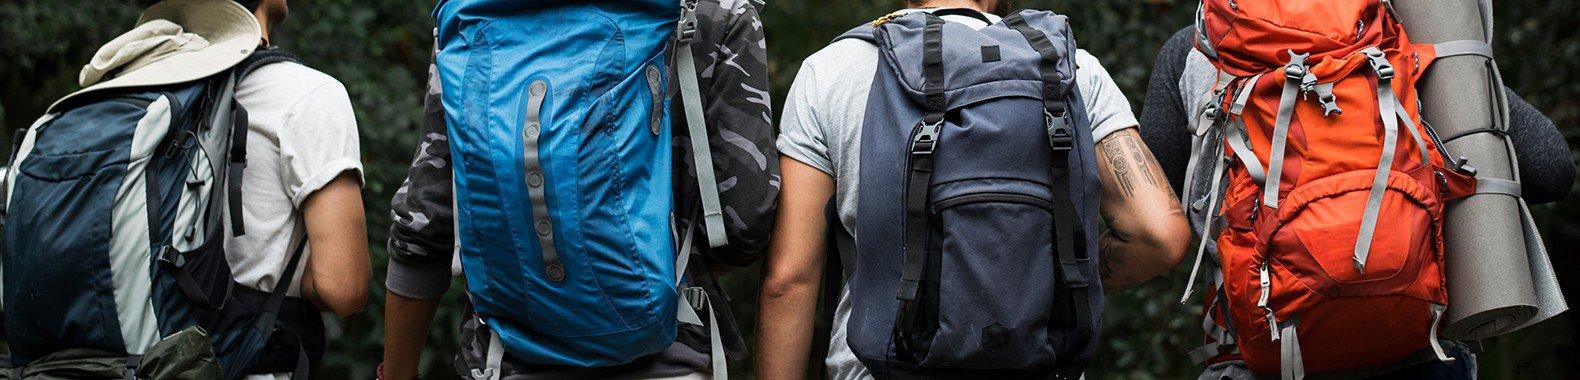 mochila barraca saco de cormir trekking acampar